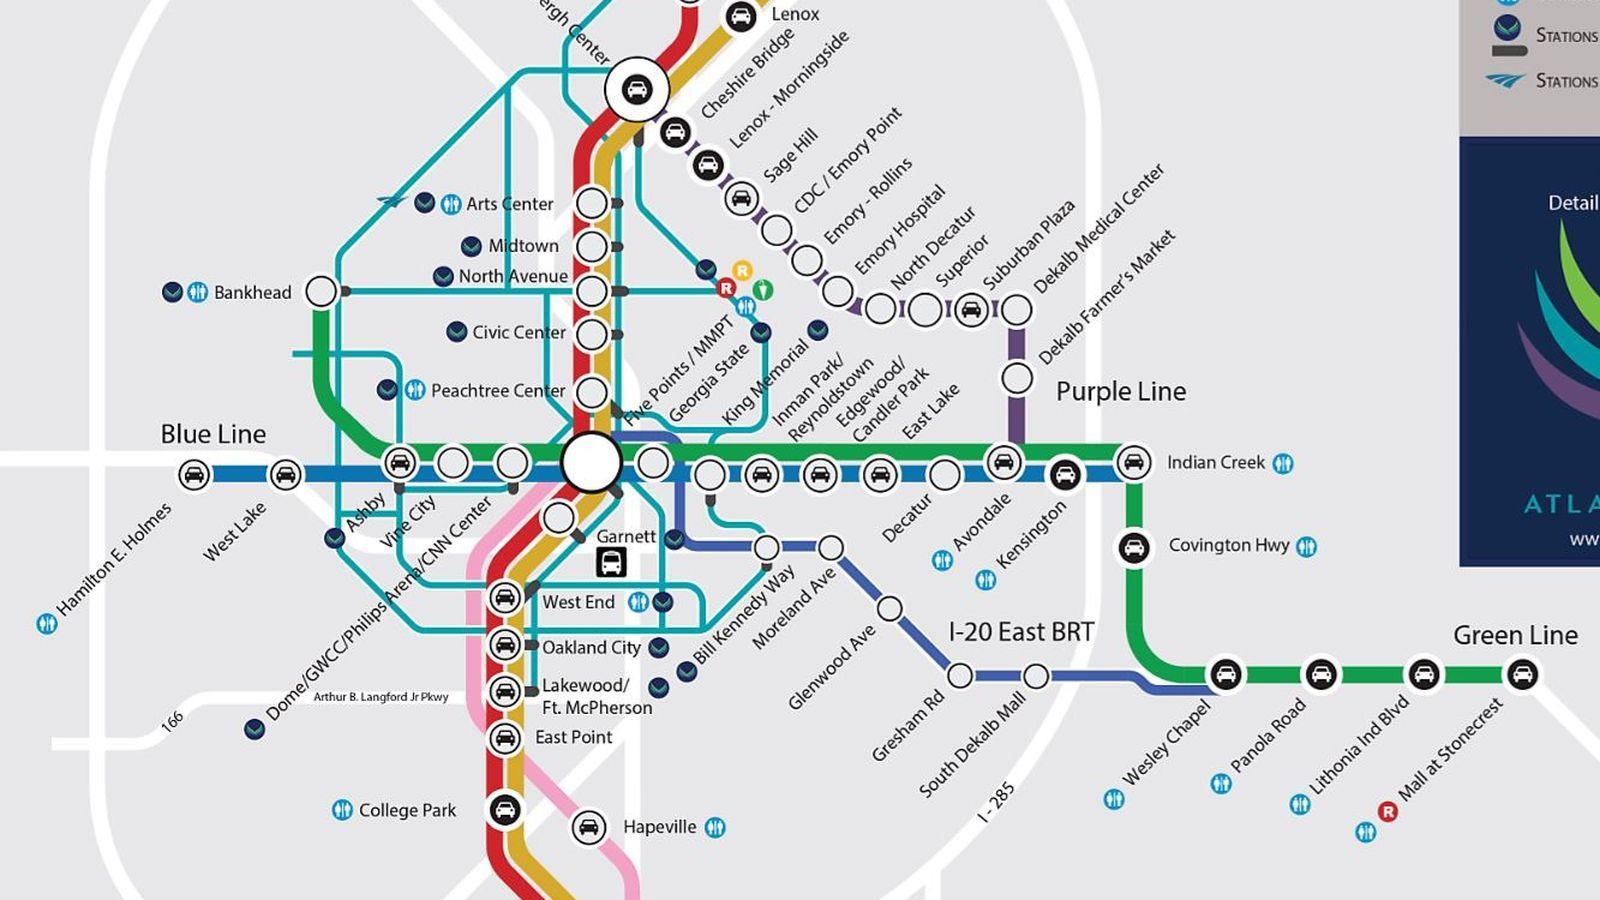 marta train station map. marta station map  marta train station map (united states of america)